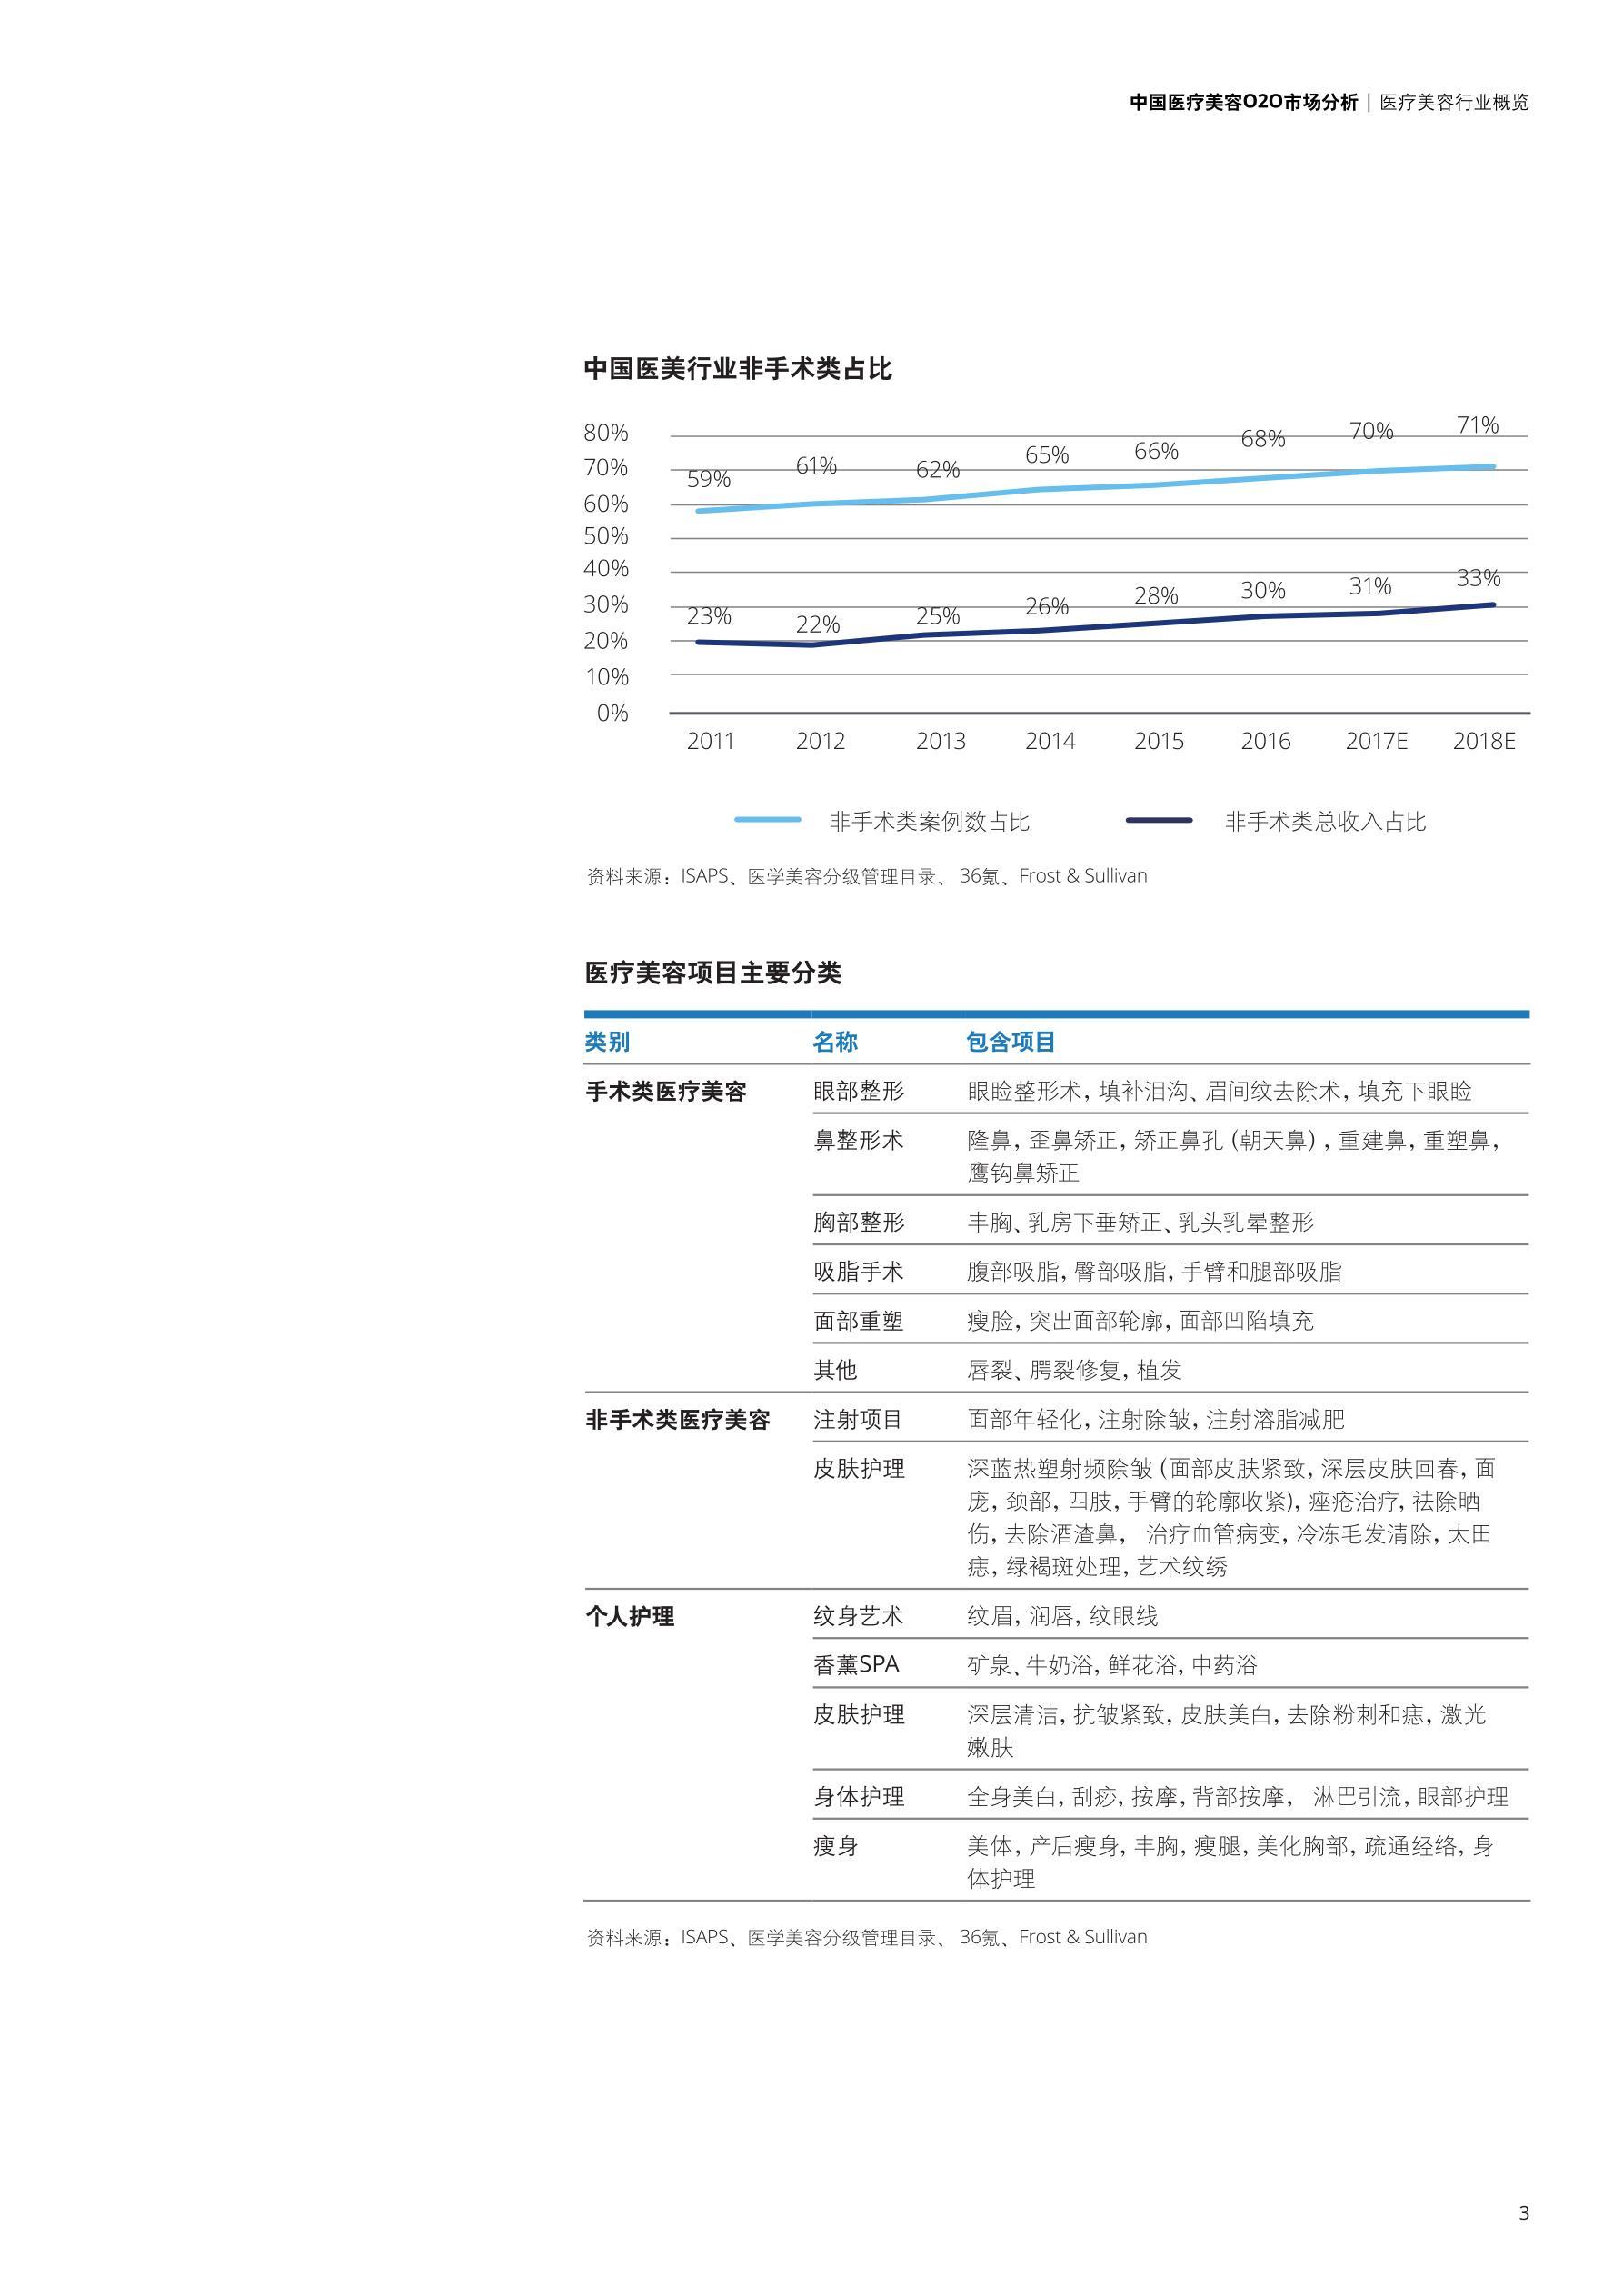 deloitte-cn-lshc-china-medical-cosmetology-o2o-market-analysis-zh-180914(1)_看图王_5